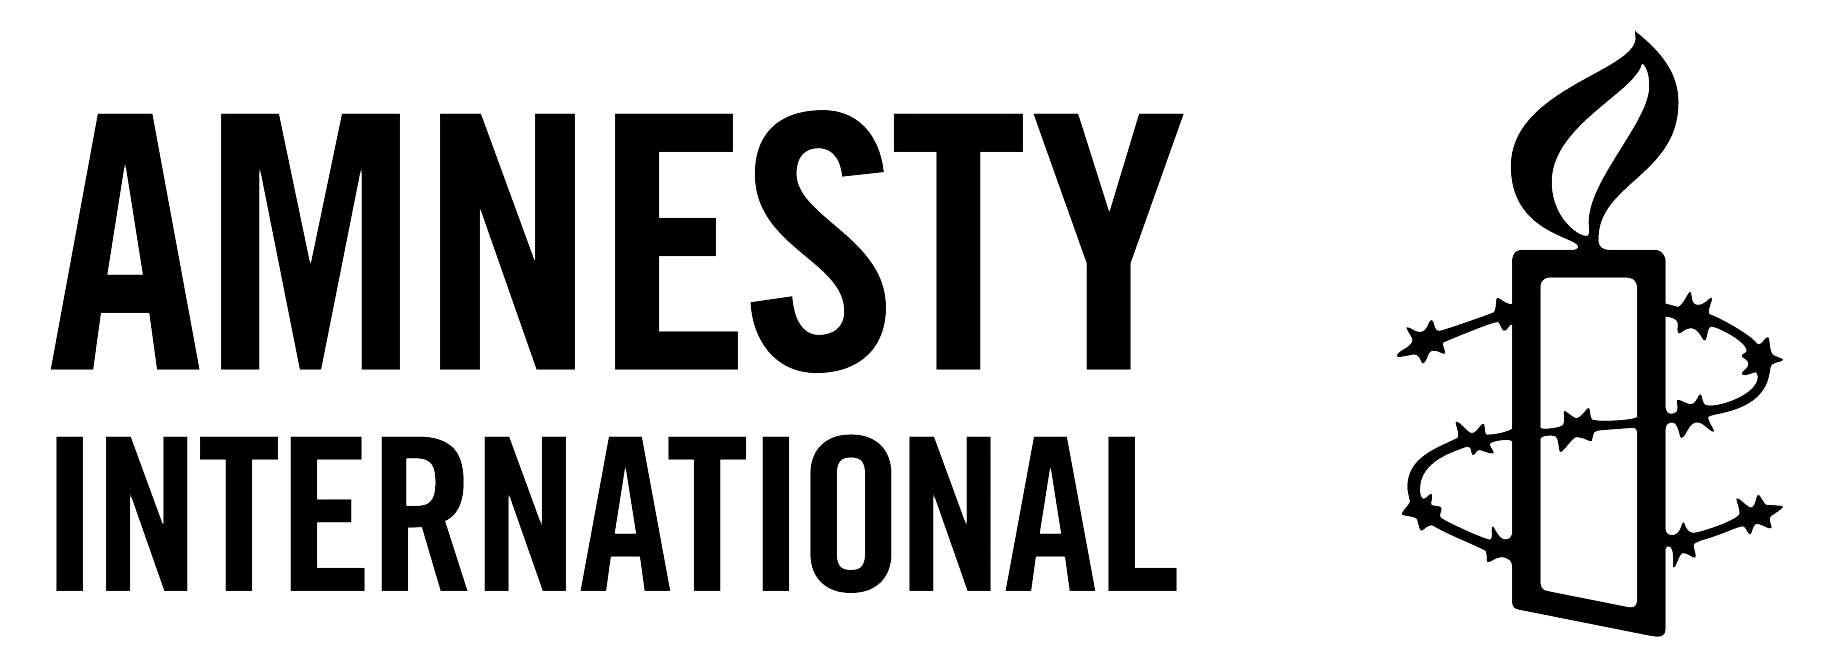 amnesty_international.png